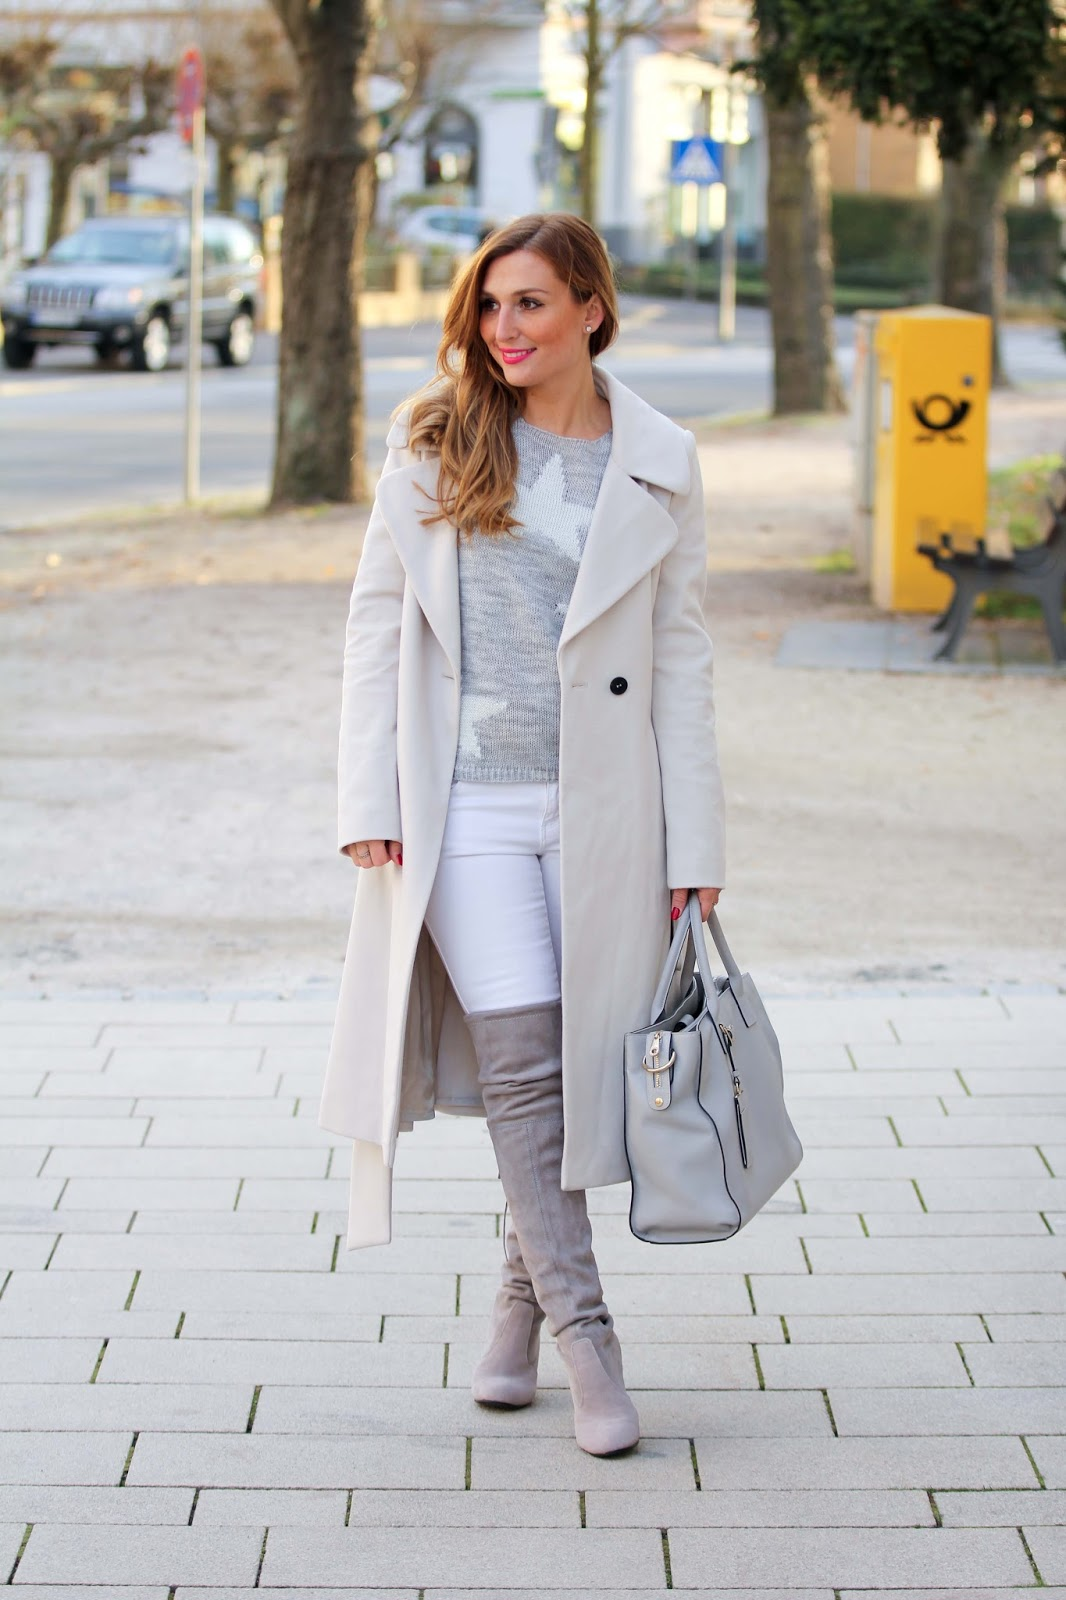 Overknees-Blogger-mit-Overknees-Start.Weitzman-Fashionstylebyjohanna-graue-Overkness-Jessica-Buurman-Jessica-Buurman-Schuhe-weißer-Mantel